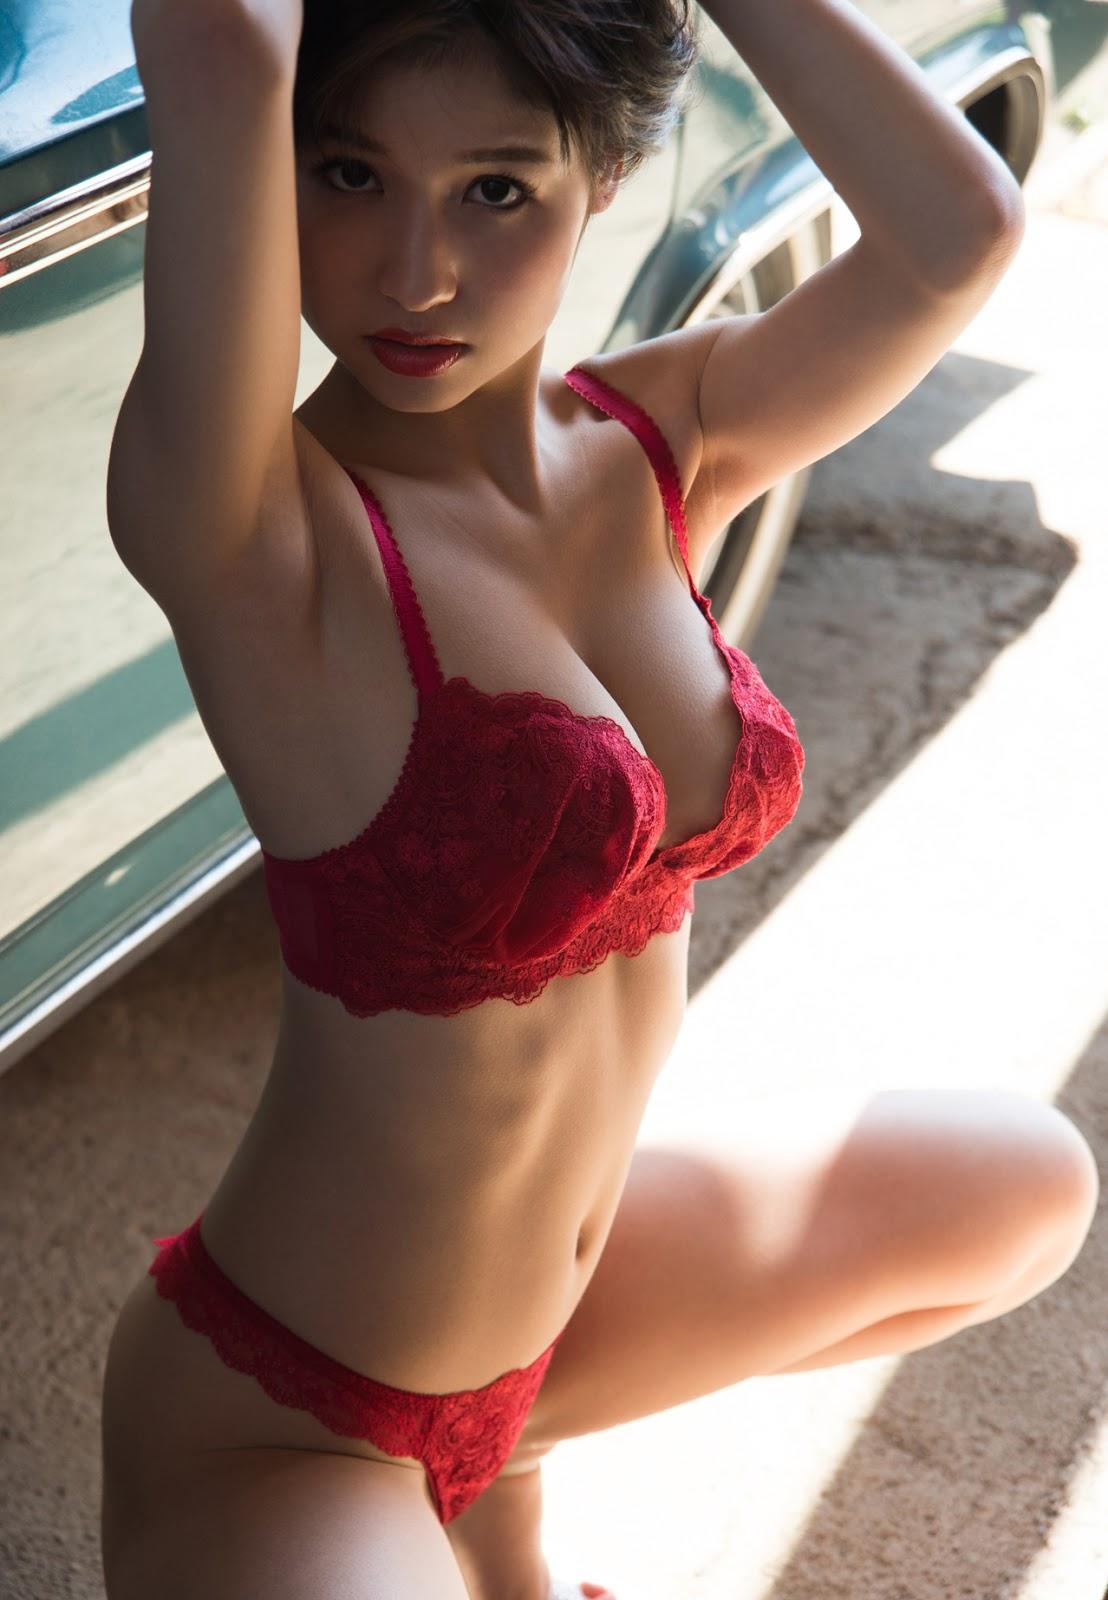 Momo Sakura